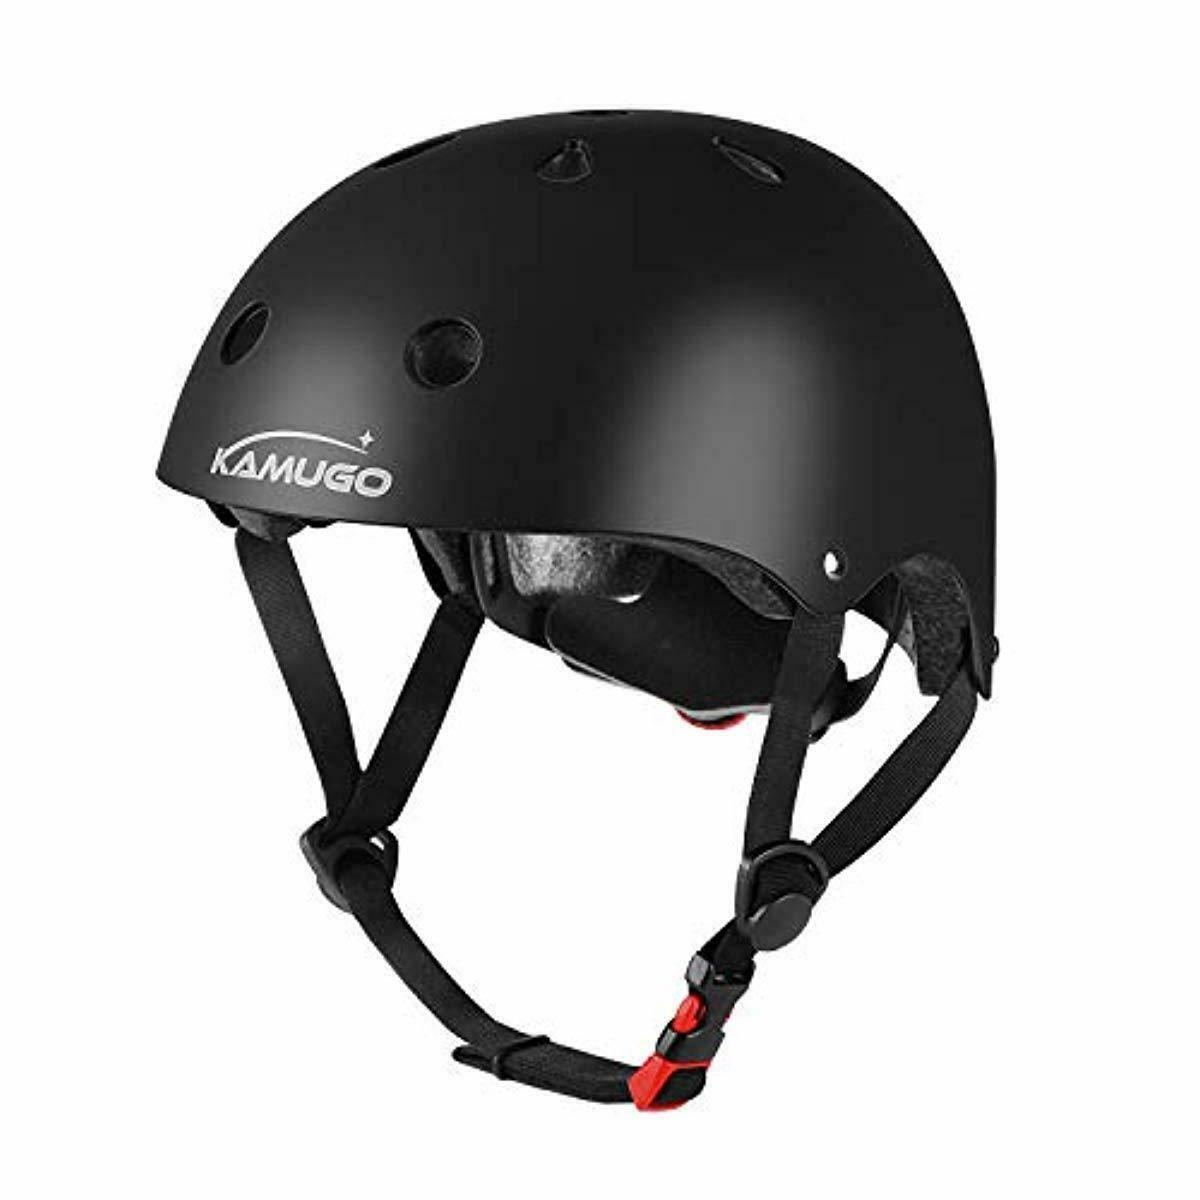 Kids Bike Helmet Adjustable Riding Helmets Safety